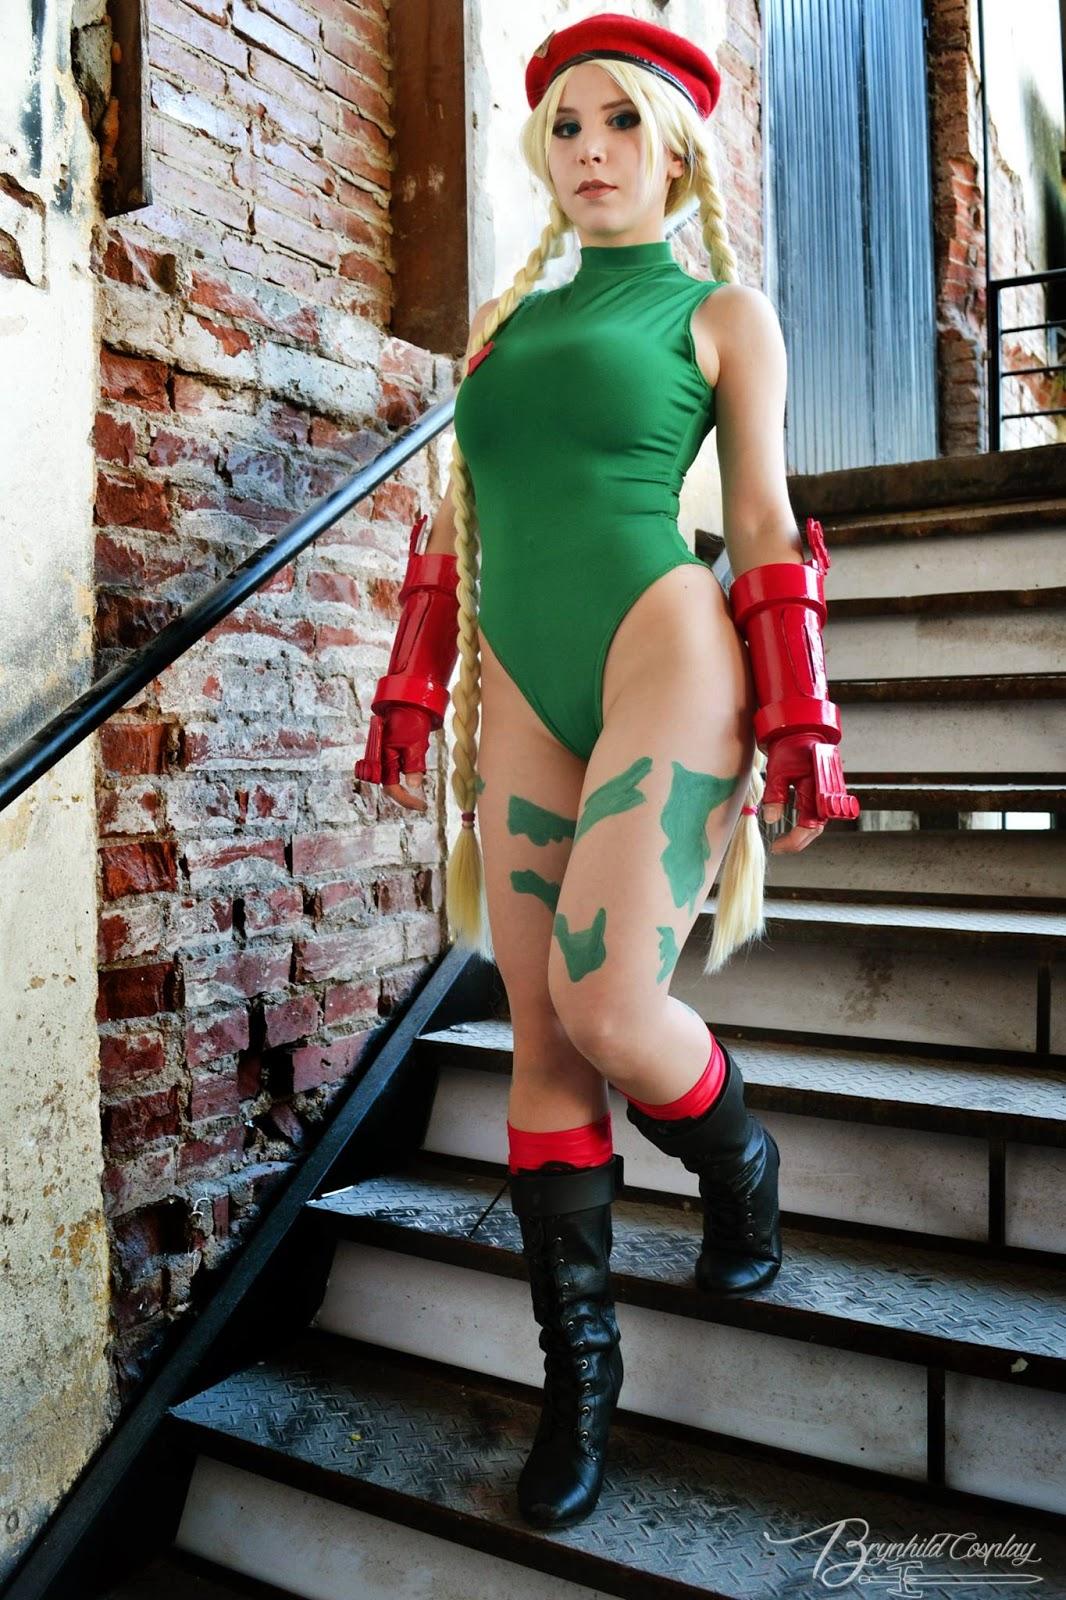 54 fotos da linda cosplayer Mirella Bertinatti (Brynhild Cosplay)